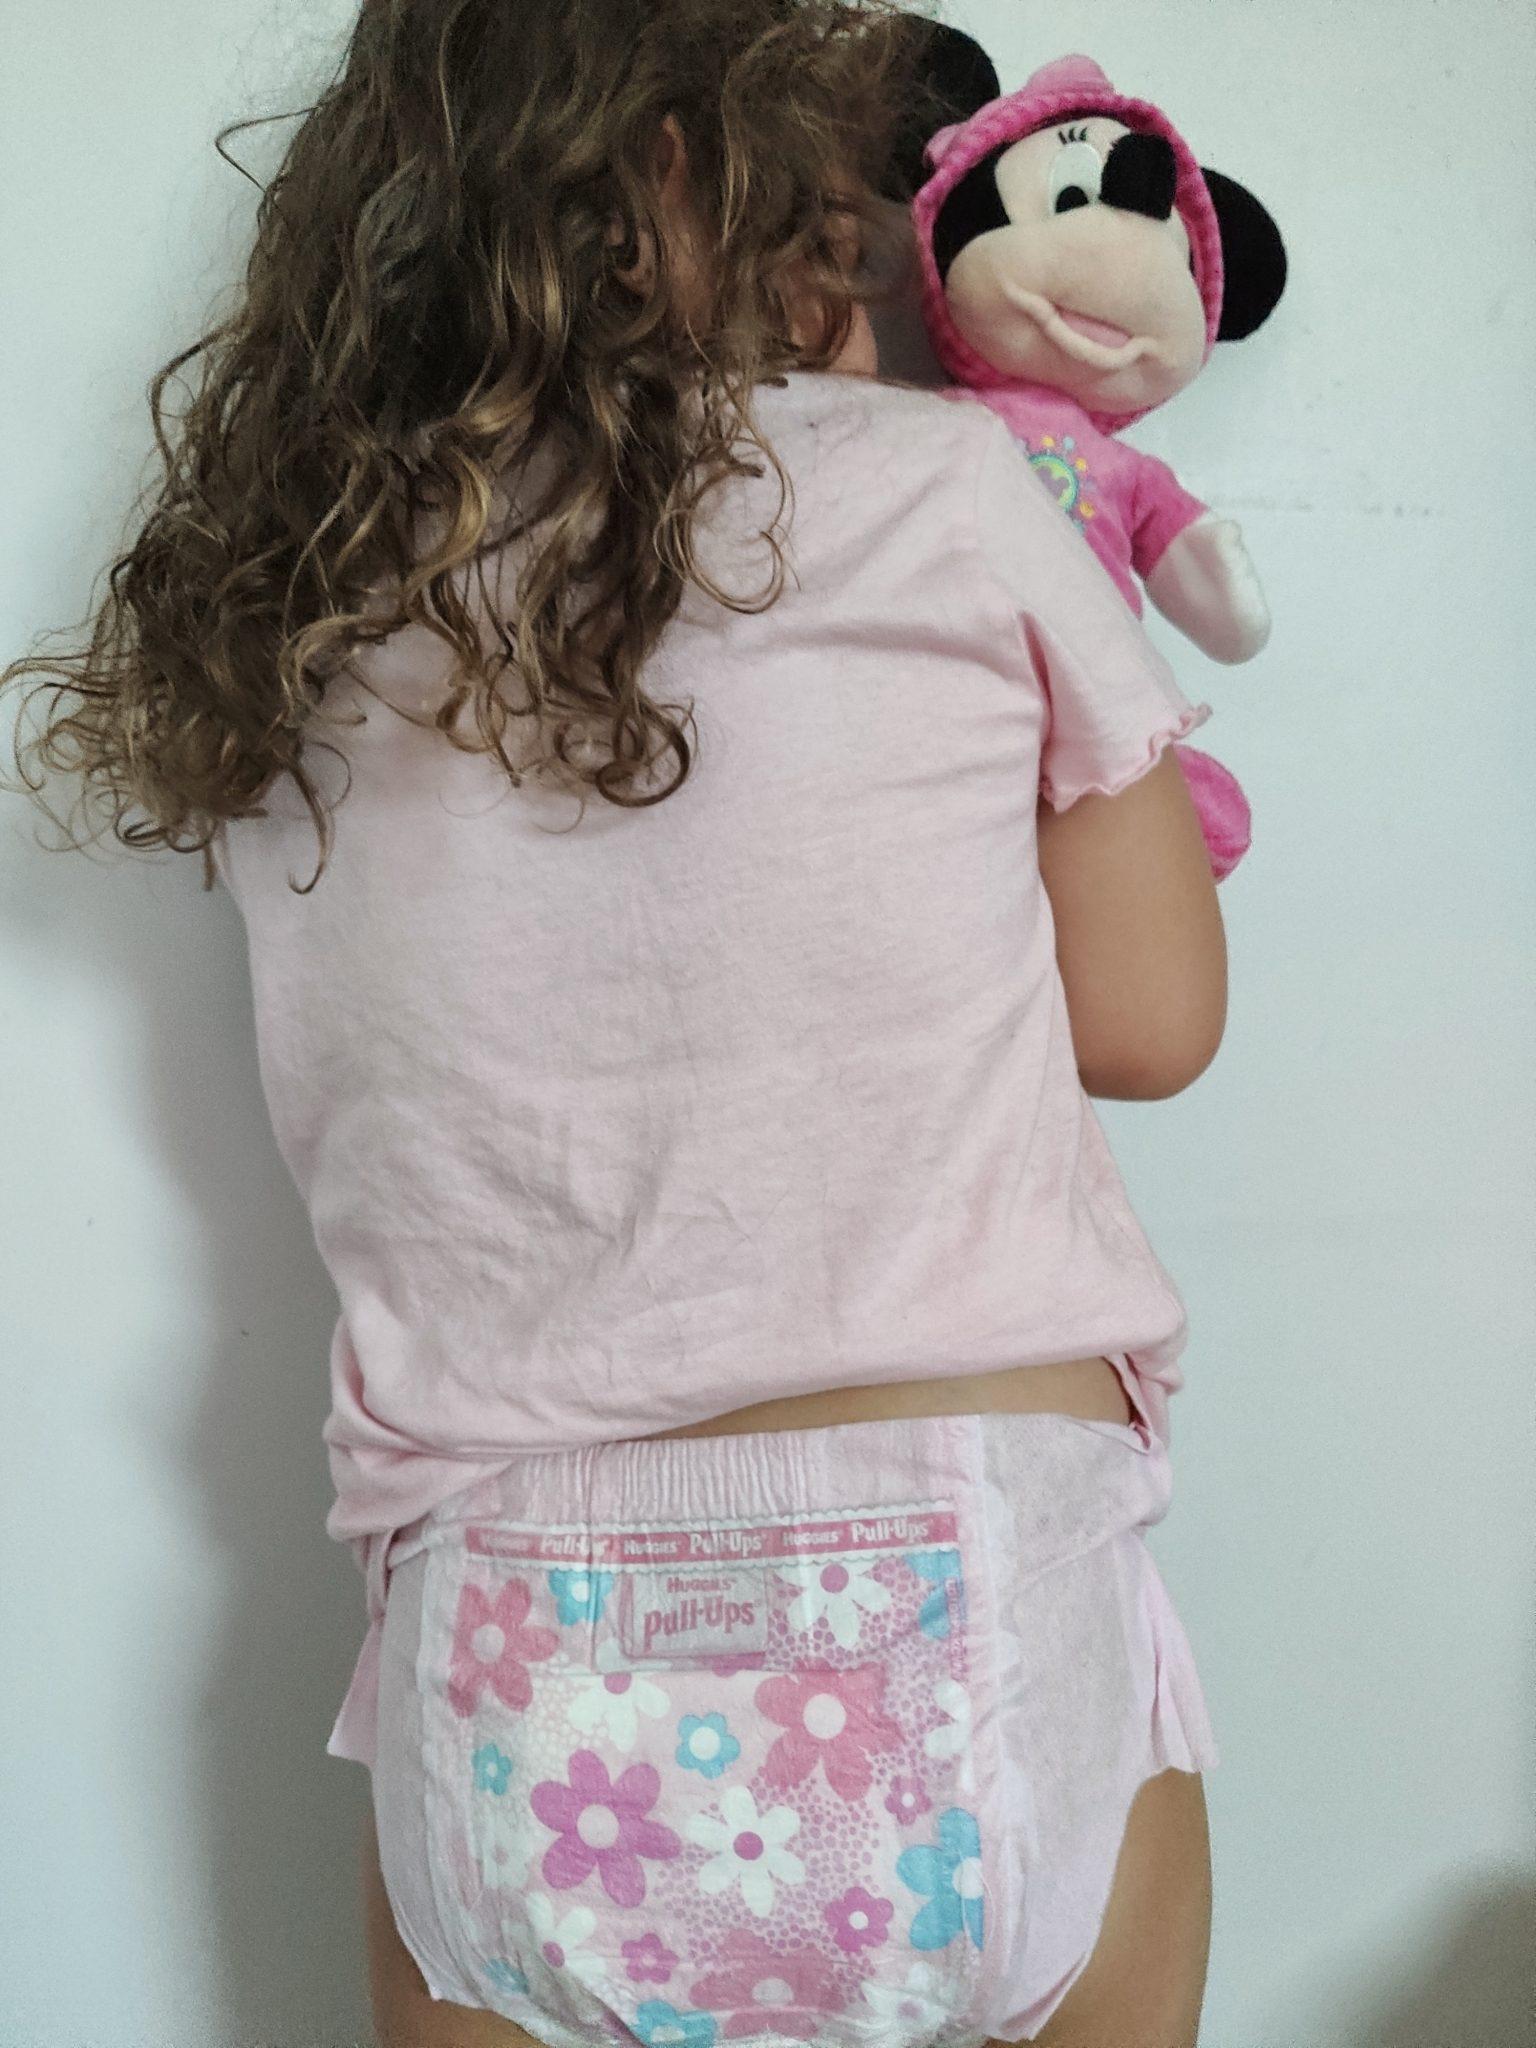 Huggies Pull Ups Blog MummyBenti propreté conseils, couche culotte